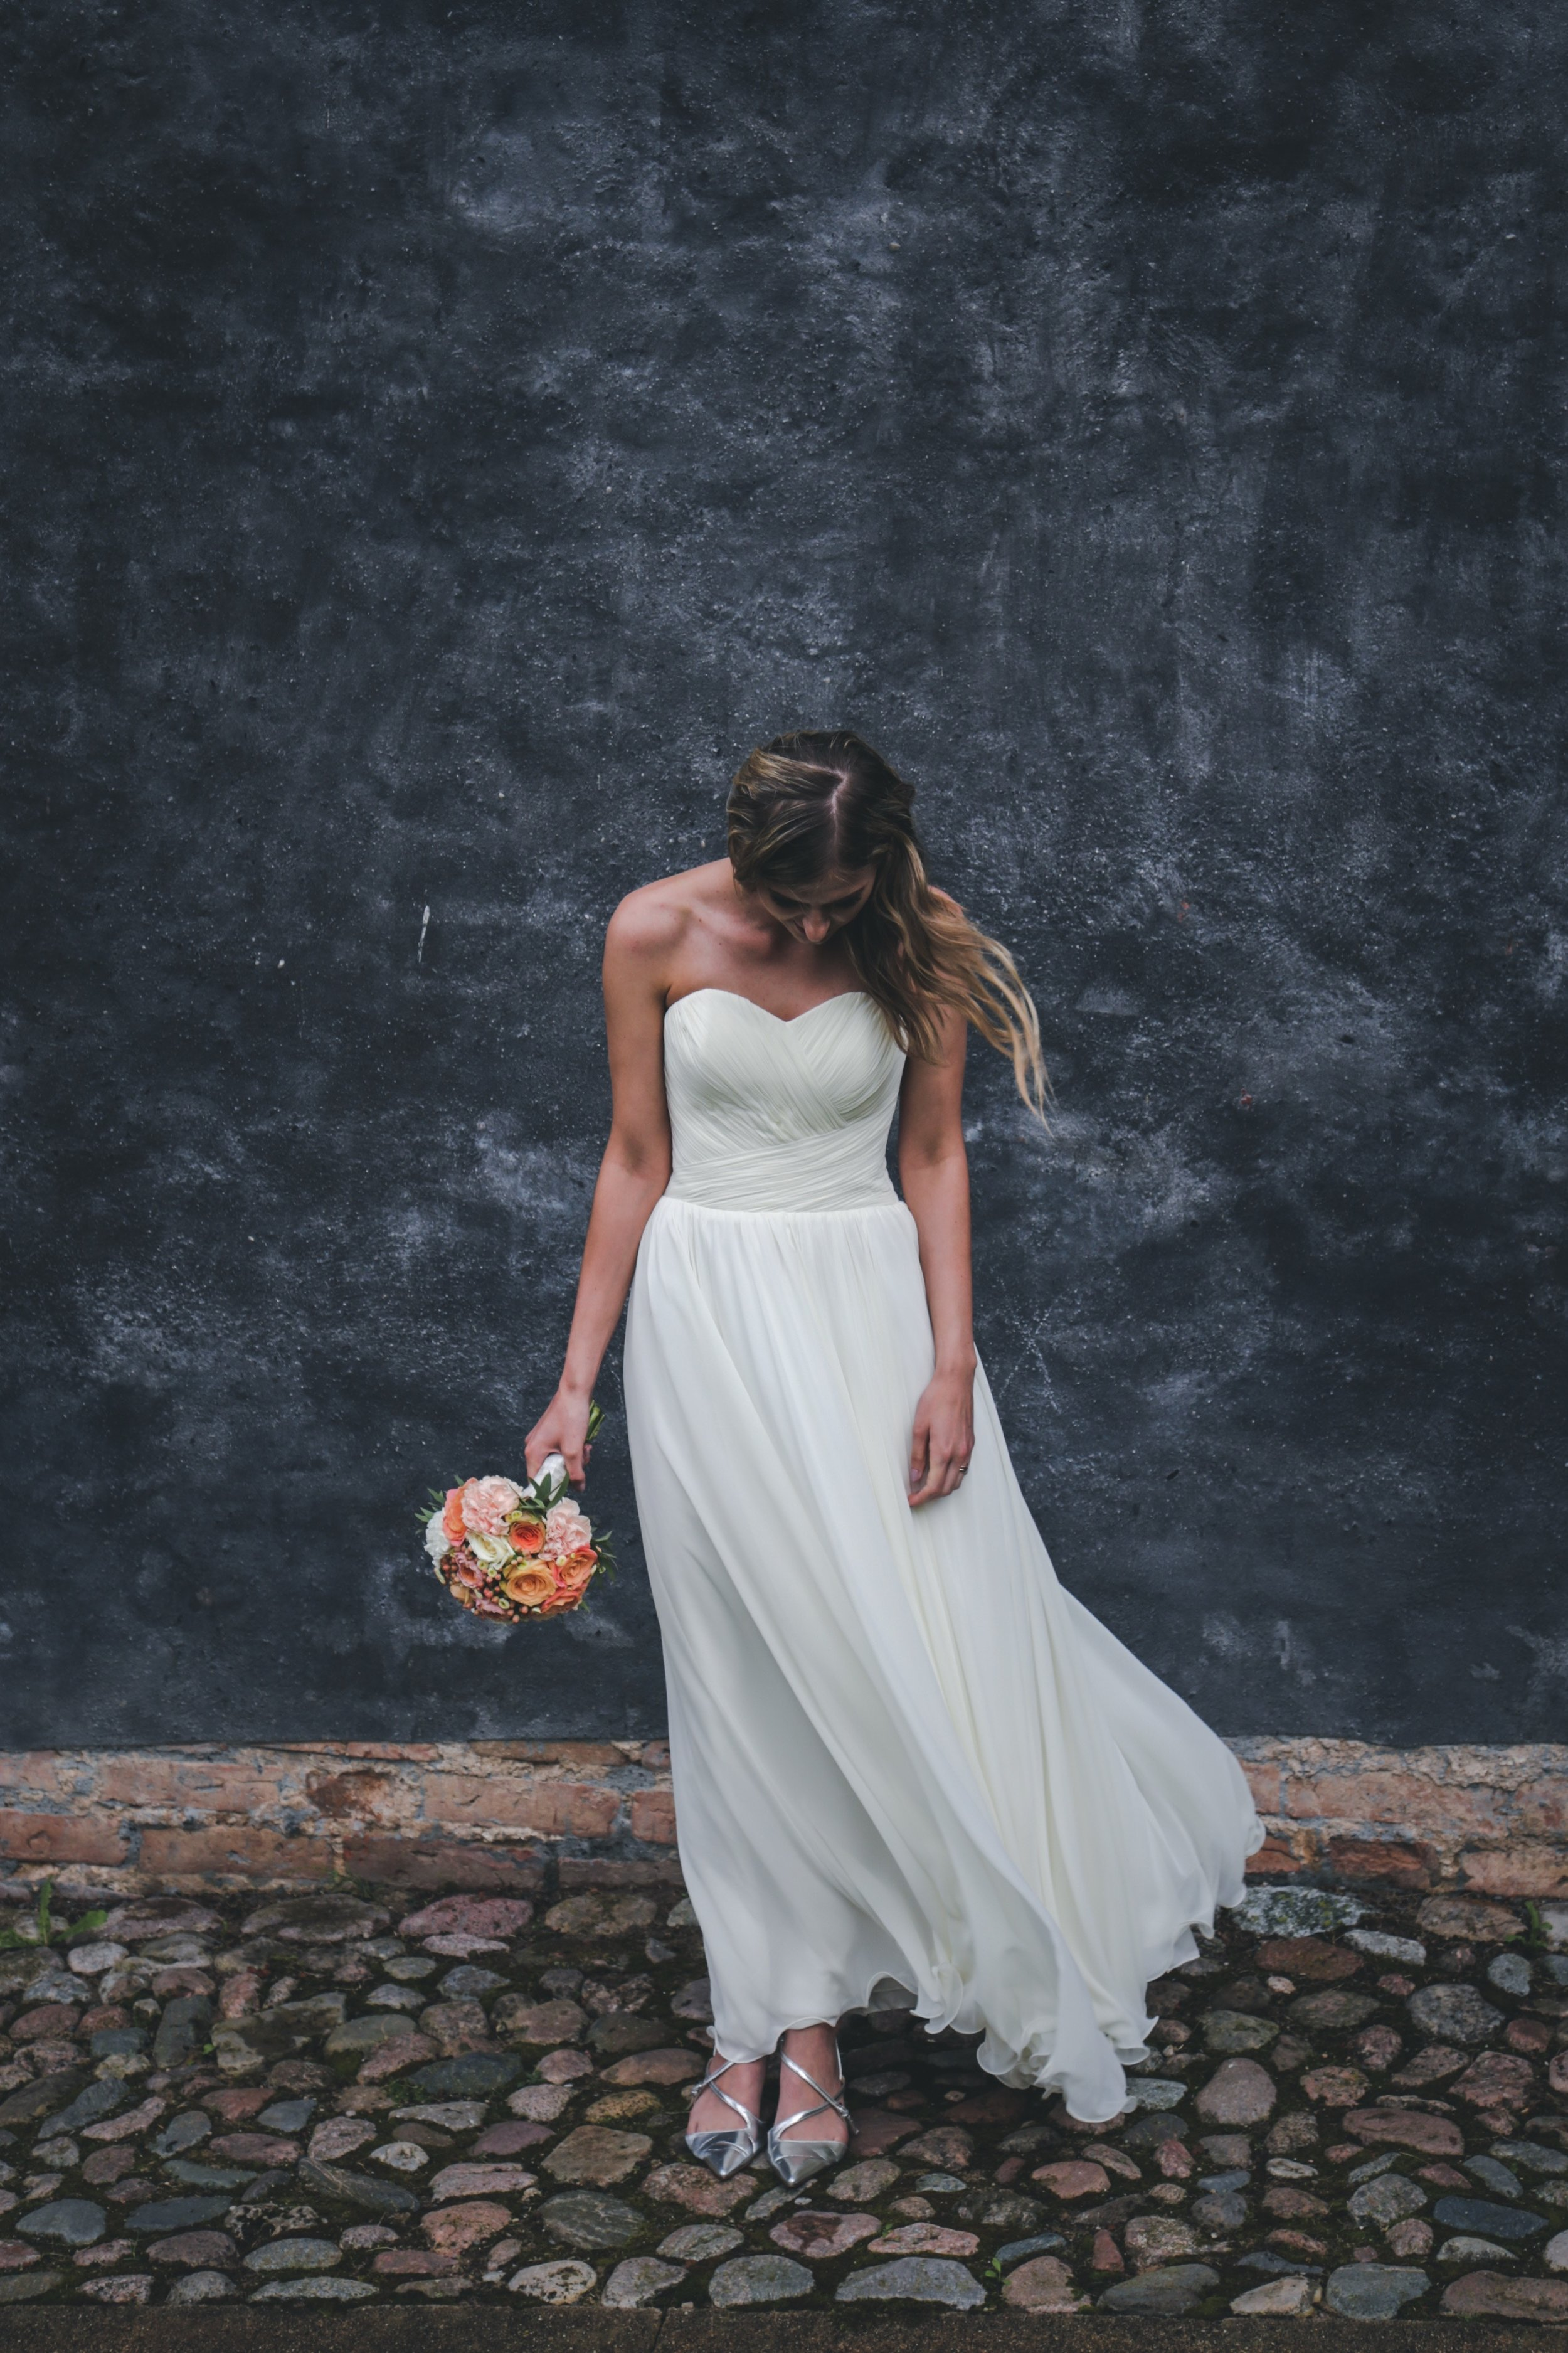 Trends to Follow in 2018 - Sweetheart Wedding Dresses 1.jpg